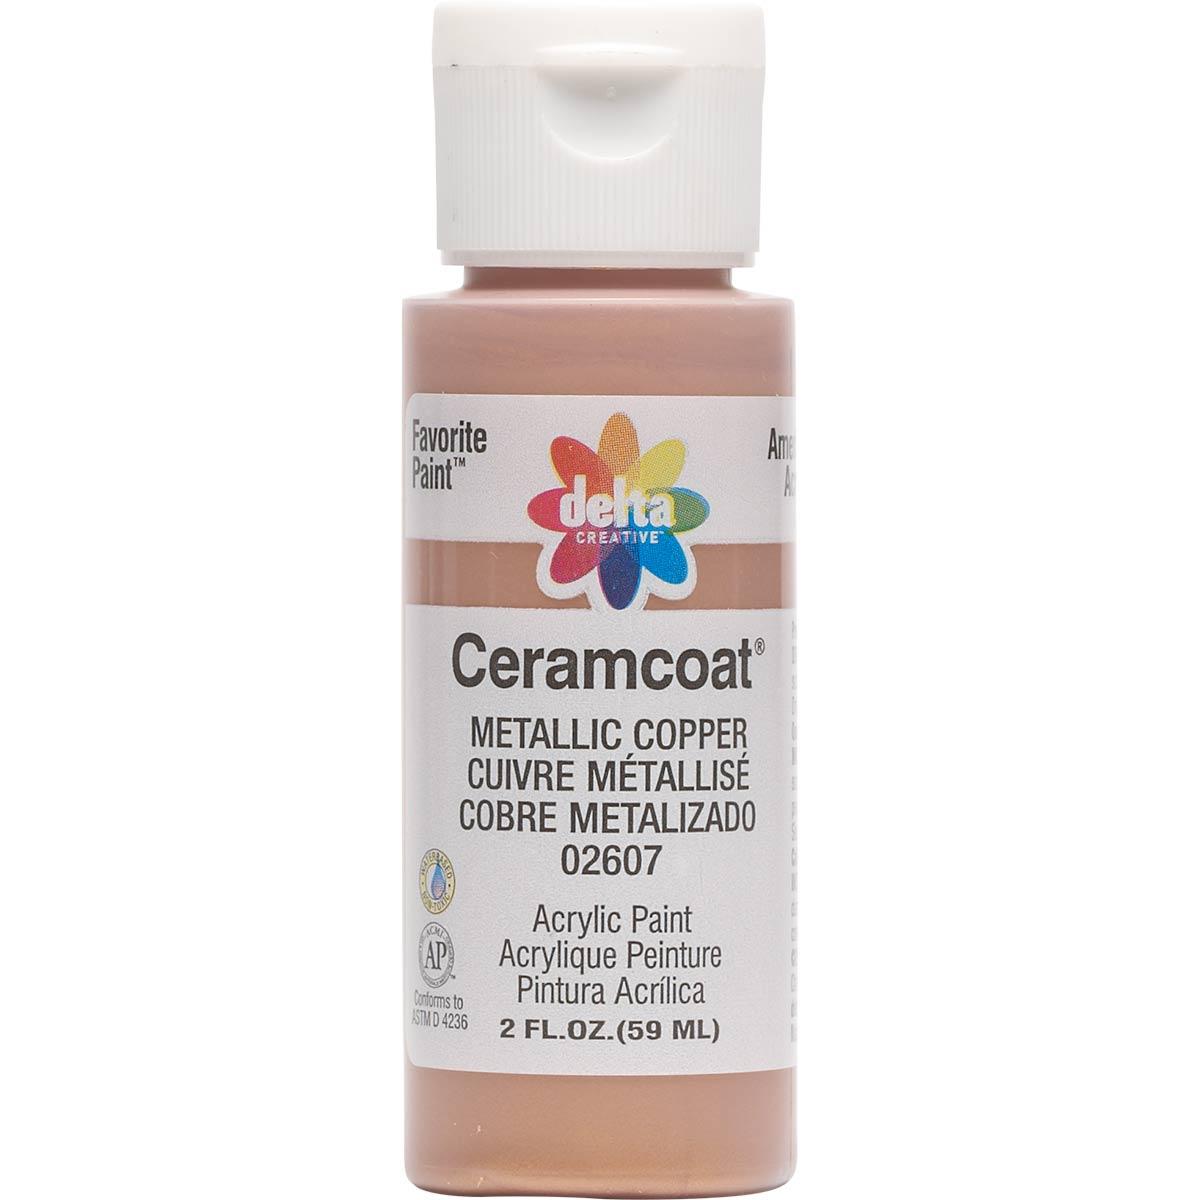 Delta Ceramcoat ® Acrylic Paint - Metallic Copper, 2 oz. - 026070202W